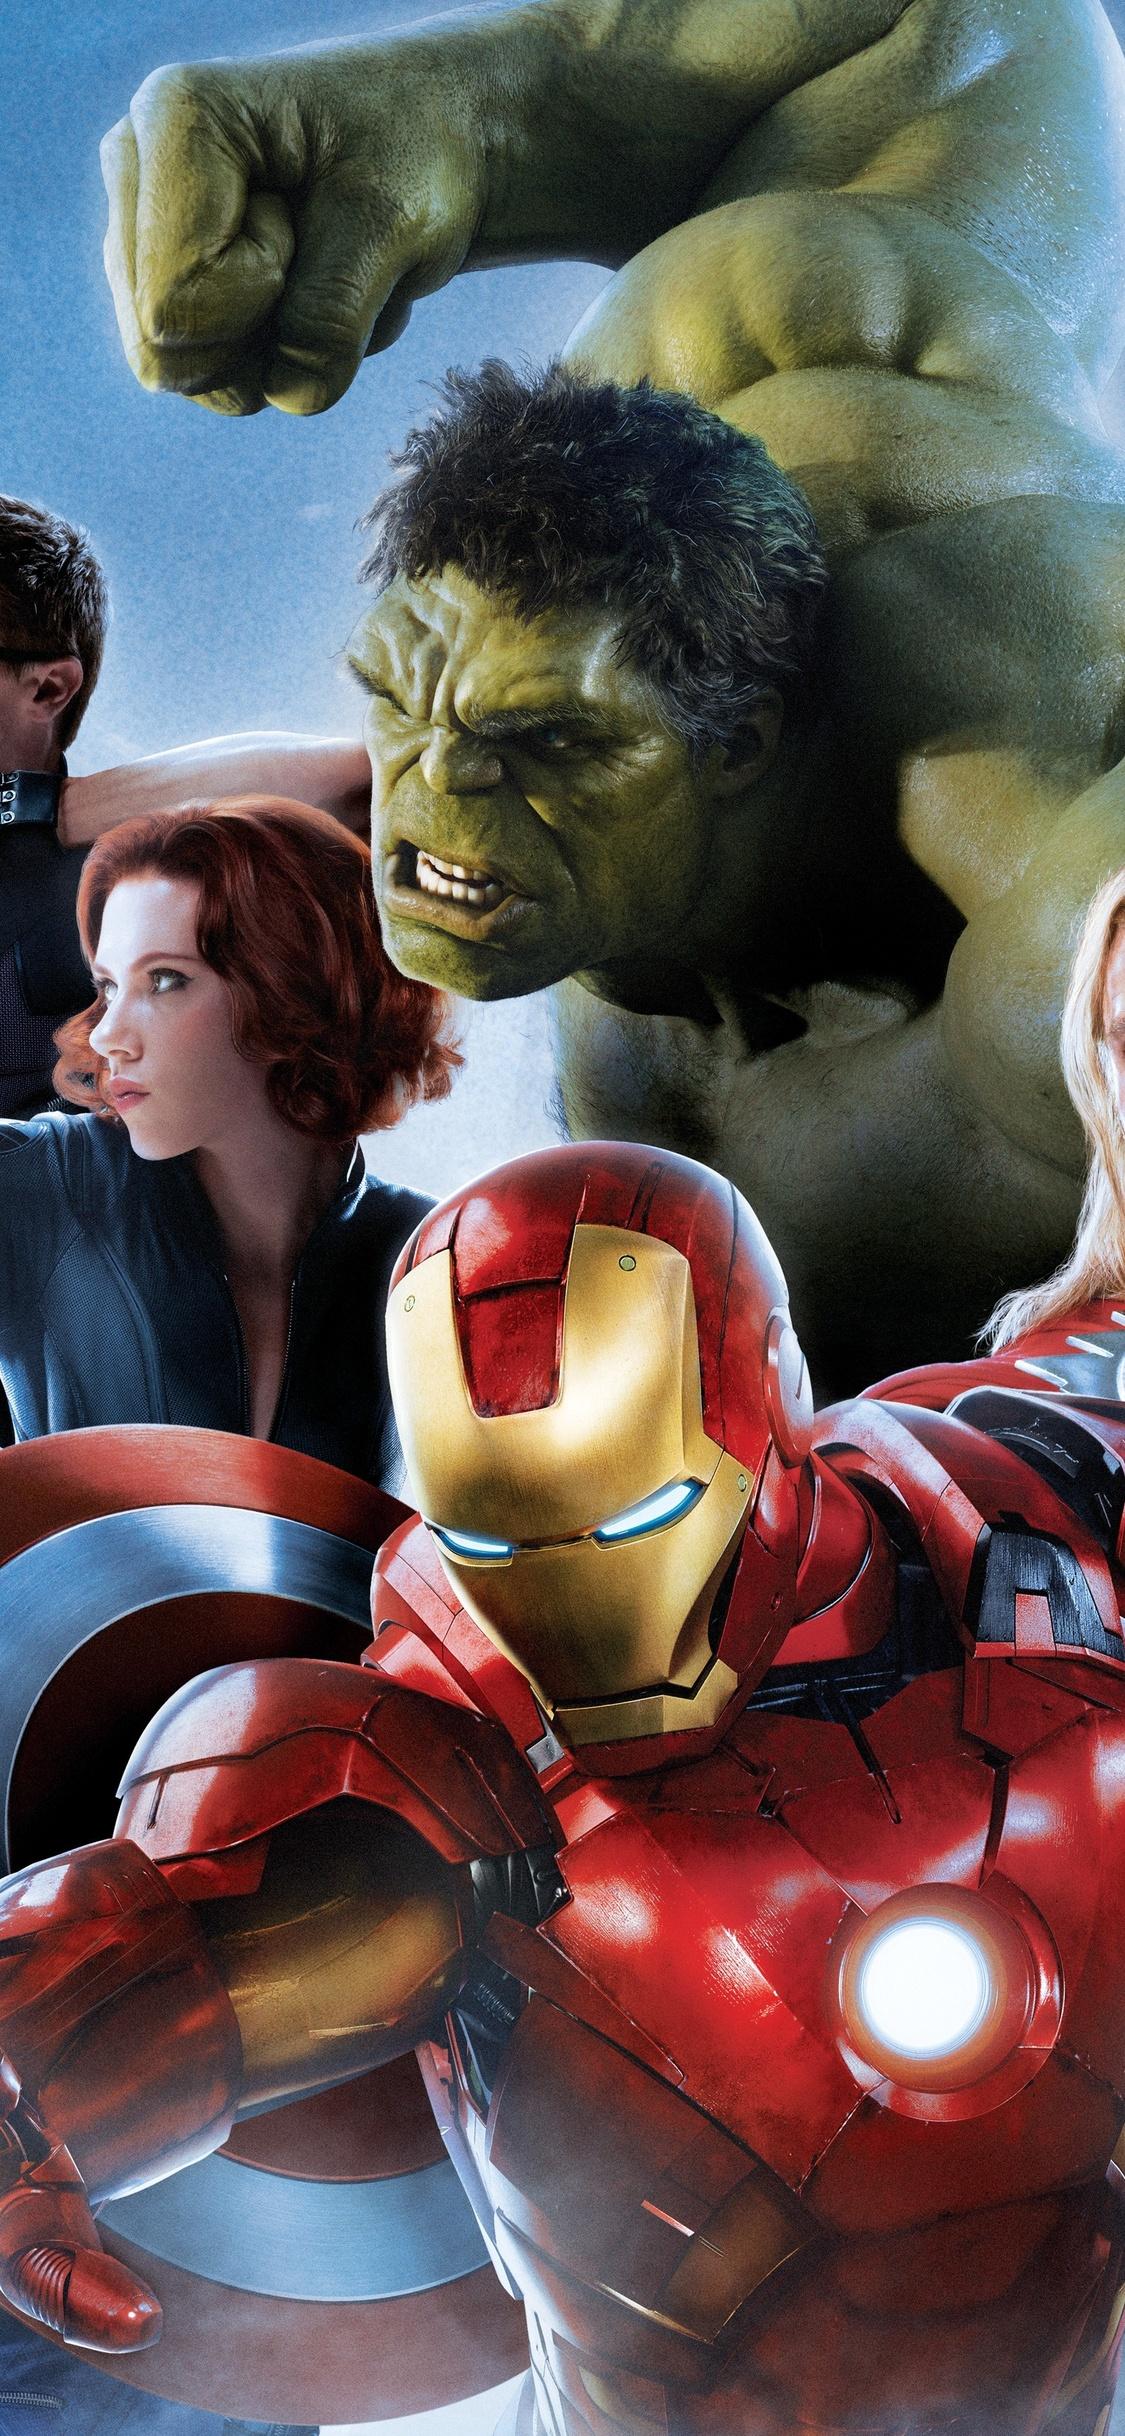 iron-man-thor-captain-america-black-widow-hawkeye-gm.jpg